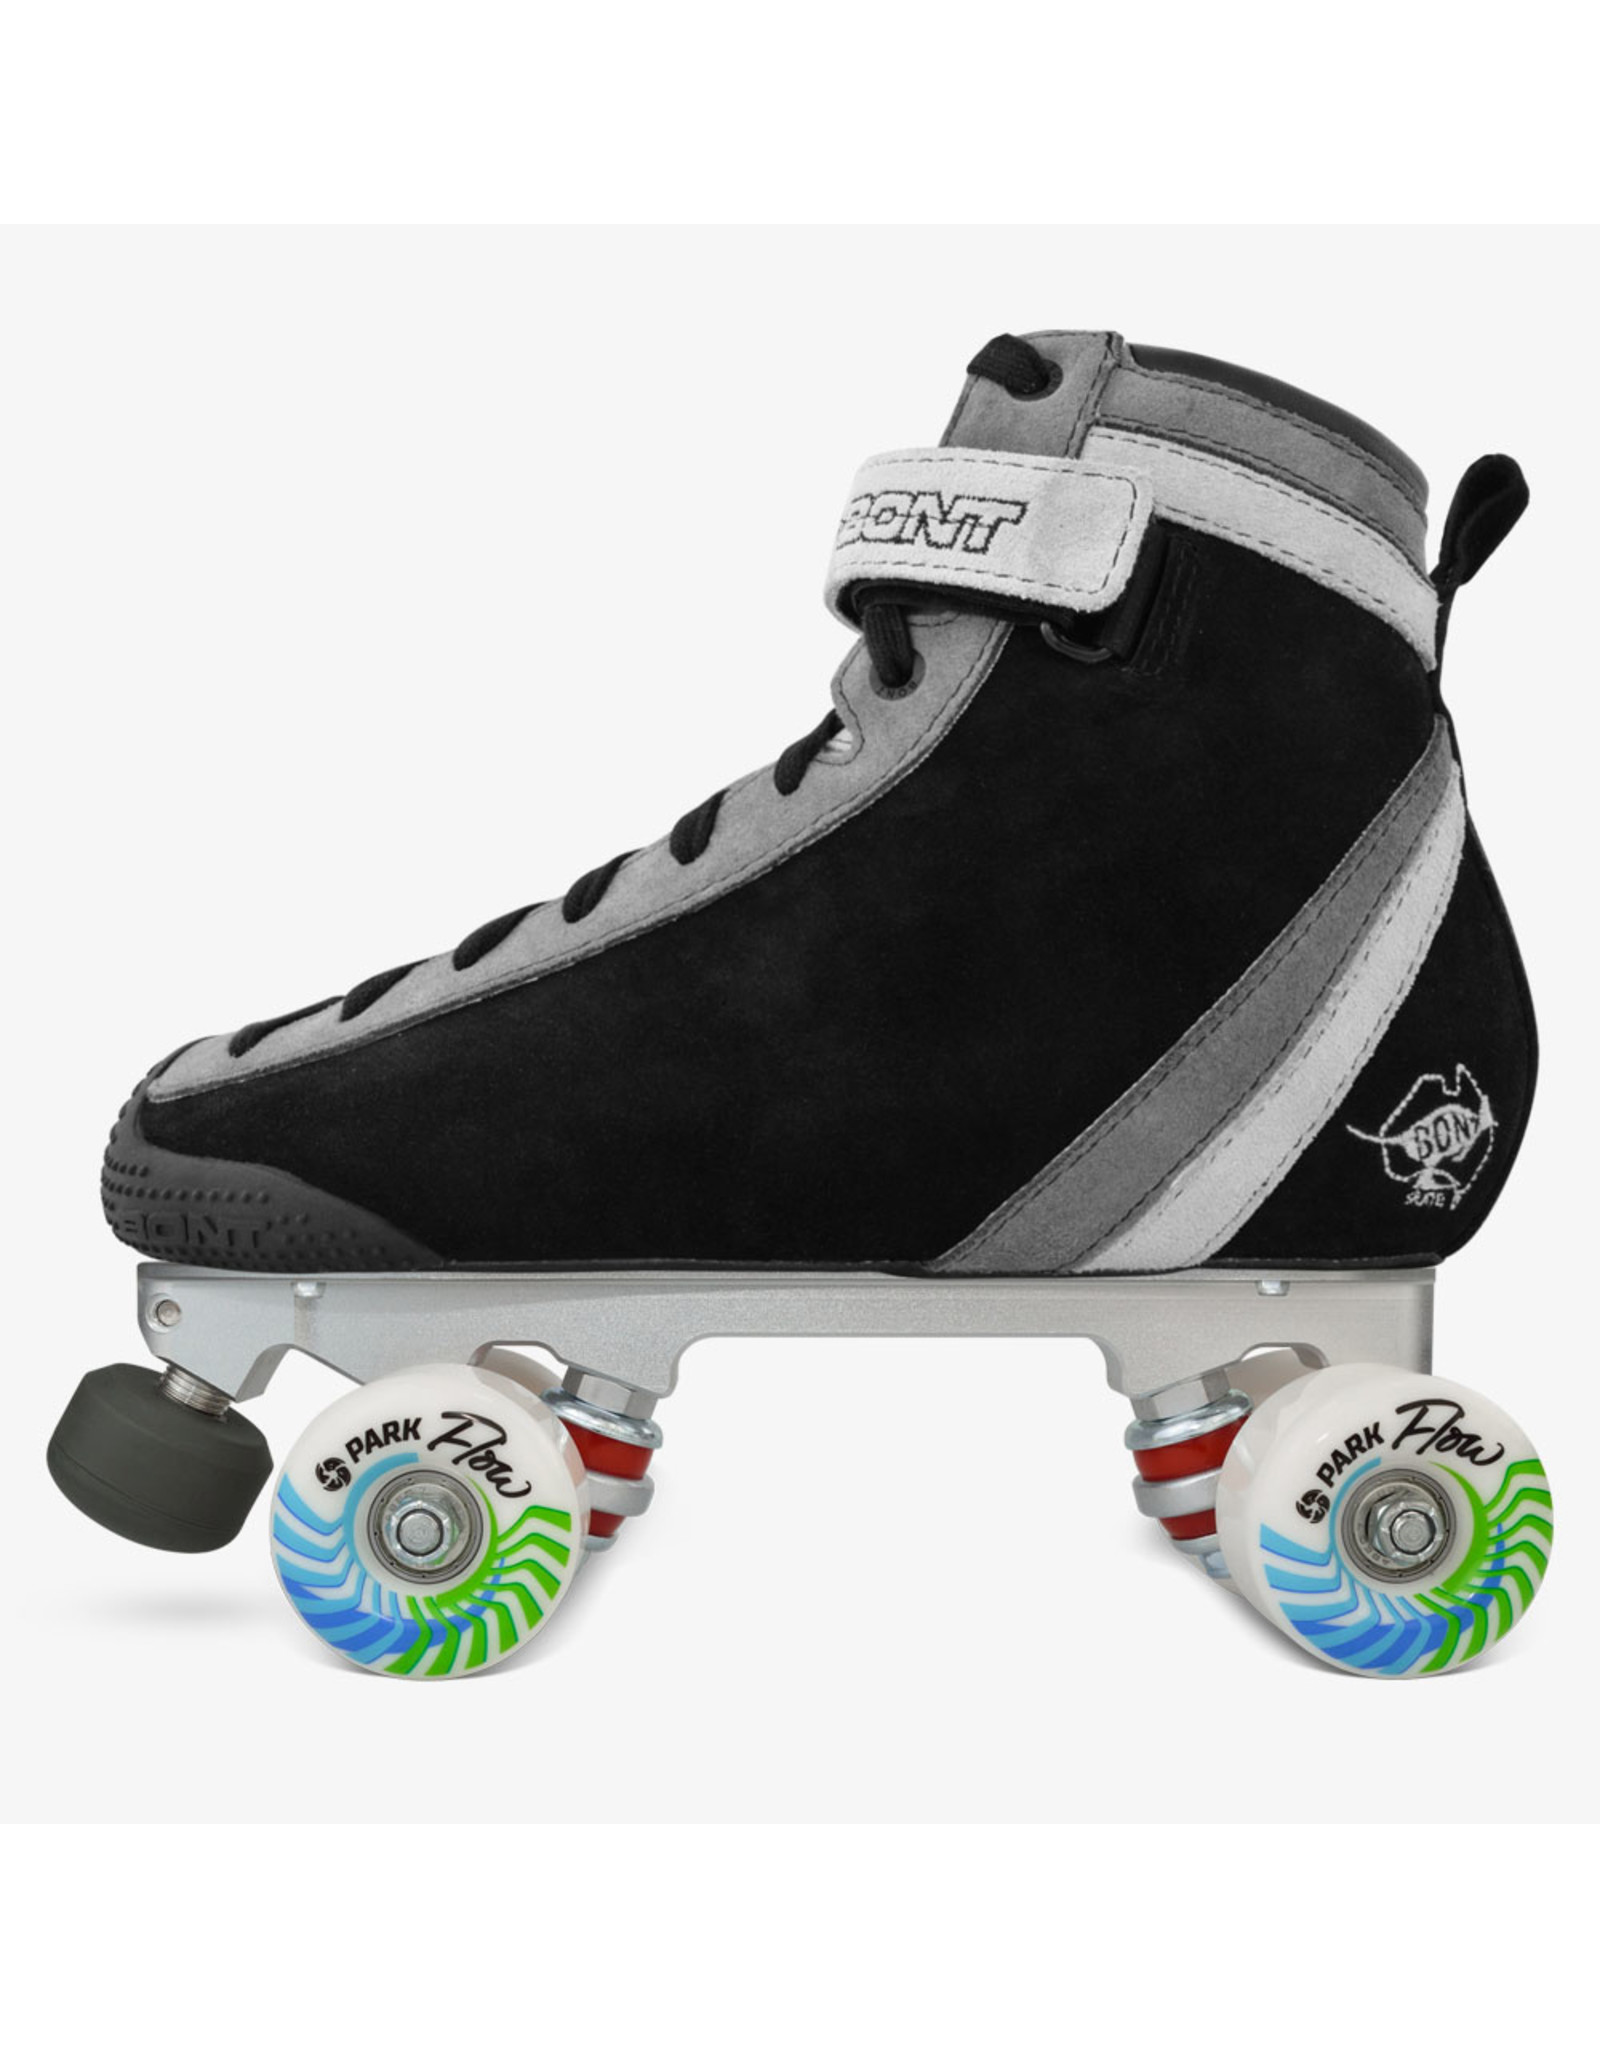 Bont Bont Parkstar Tracer with Flow wheels